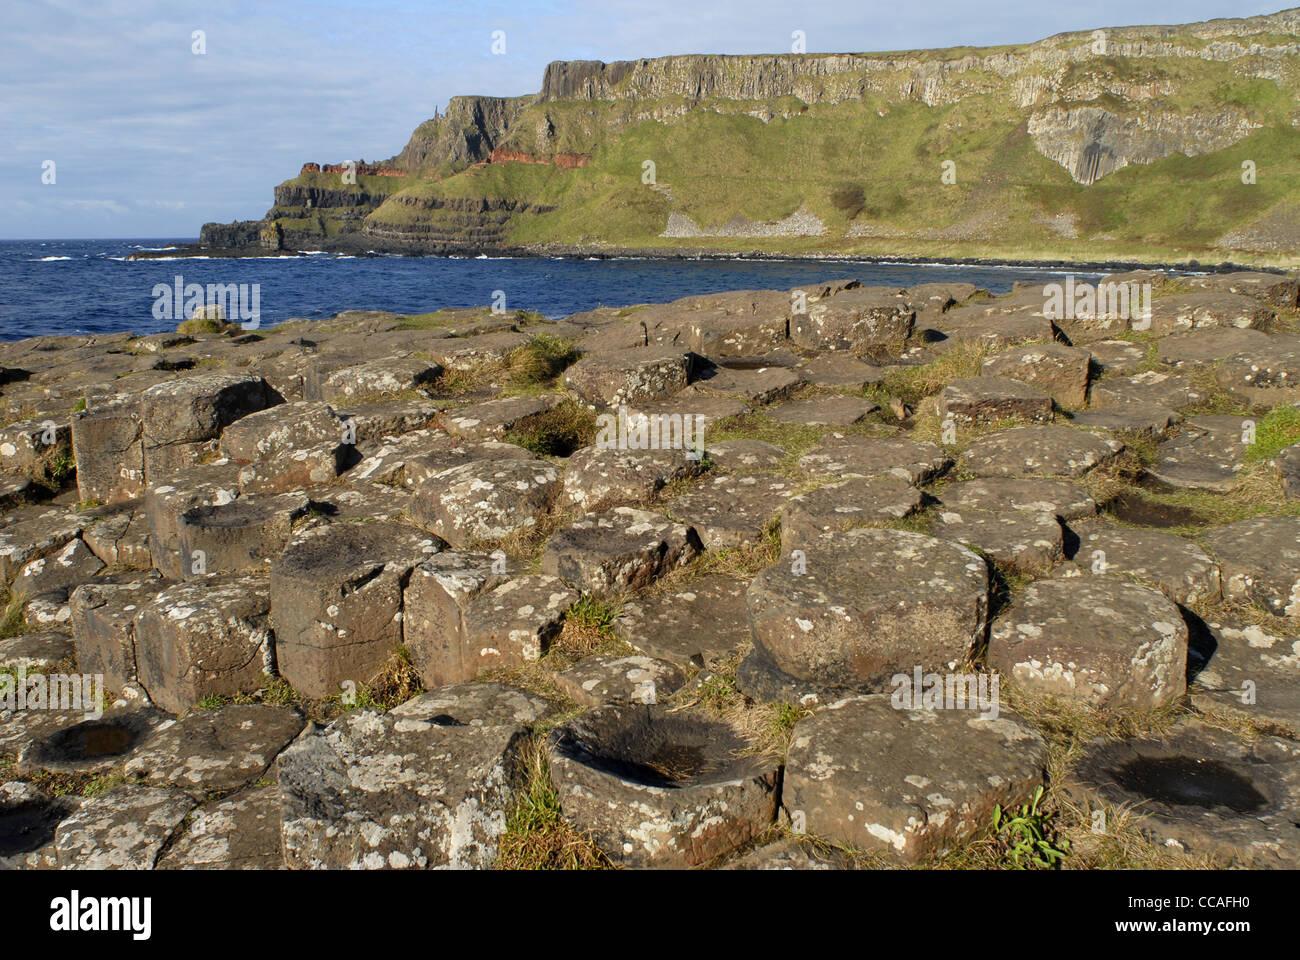 Giant's Causeway, Coastal Road, County Antrim, Ulster, North Ireland, UK, Europe. - Stock Image